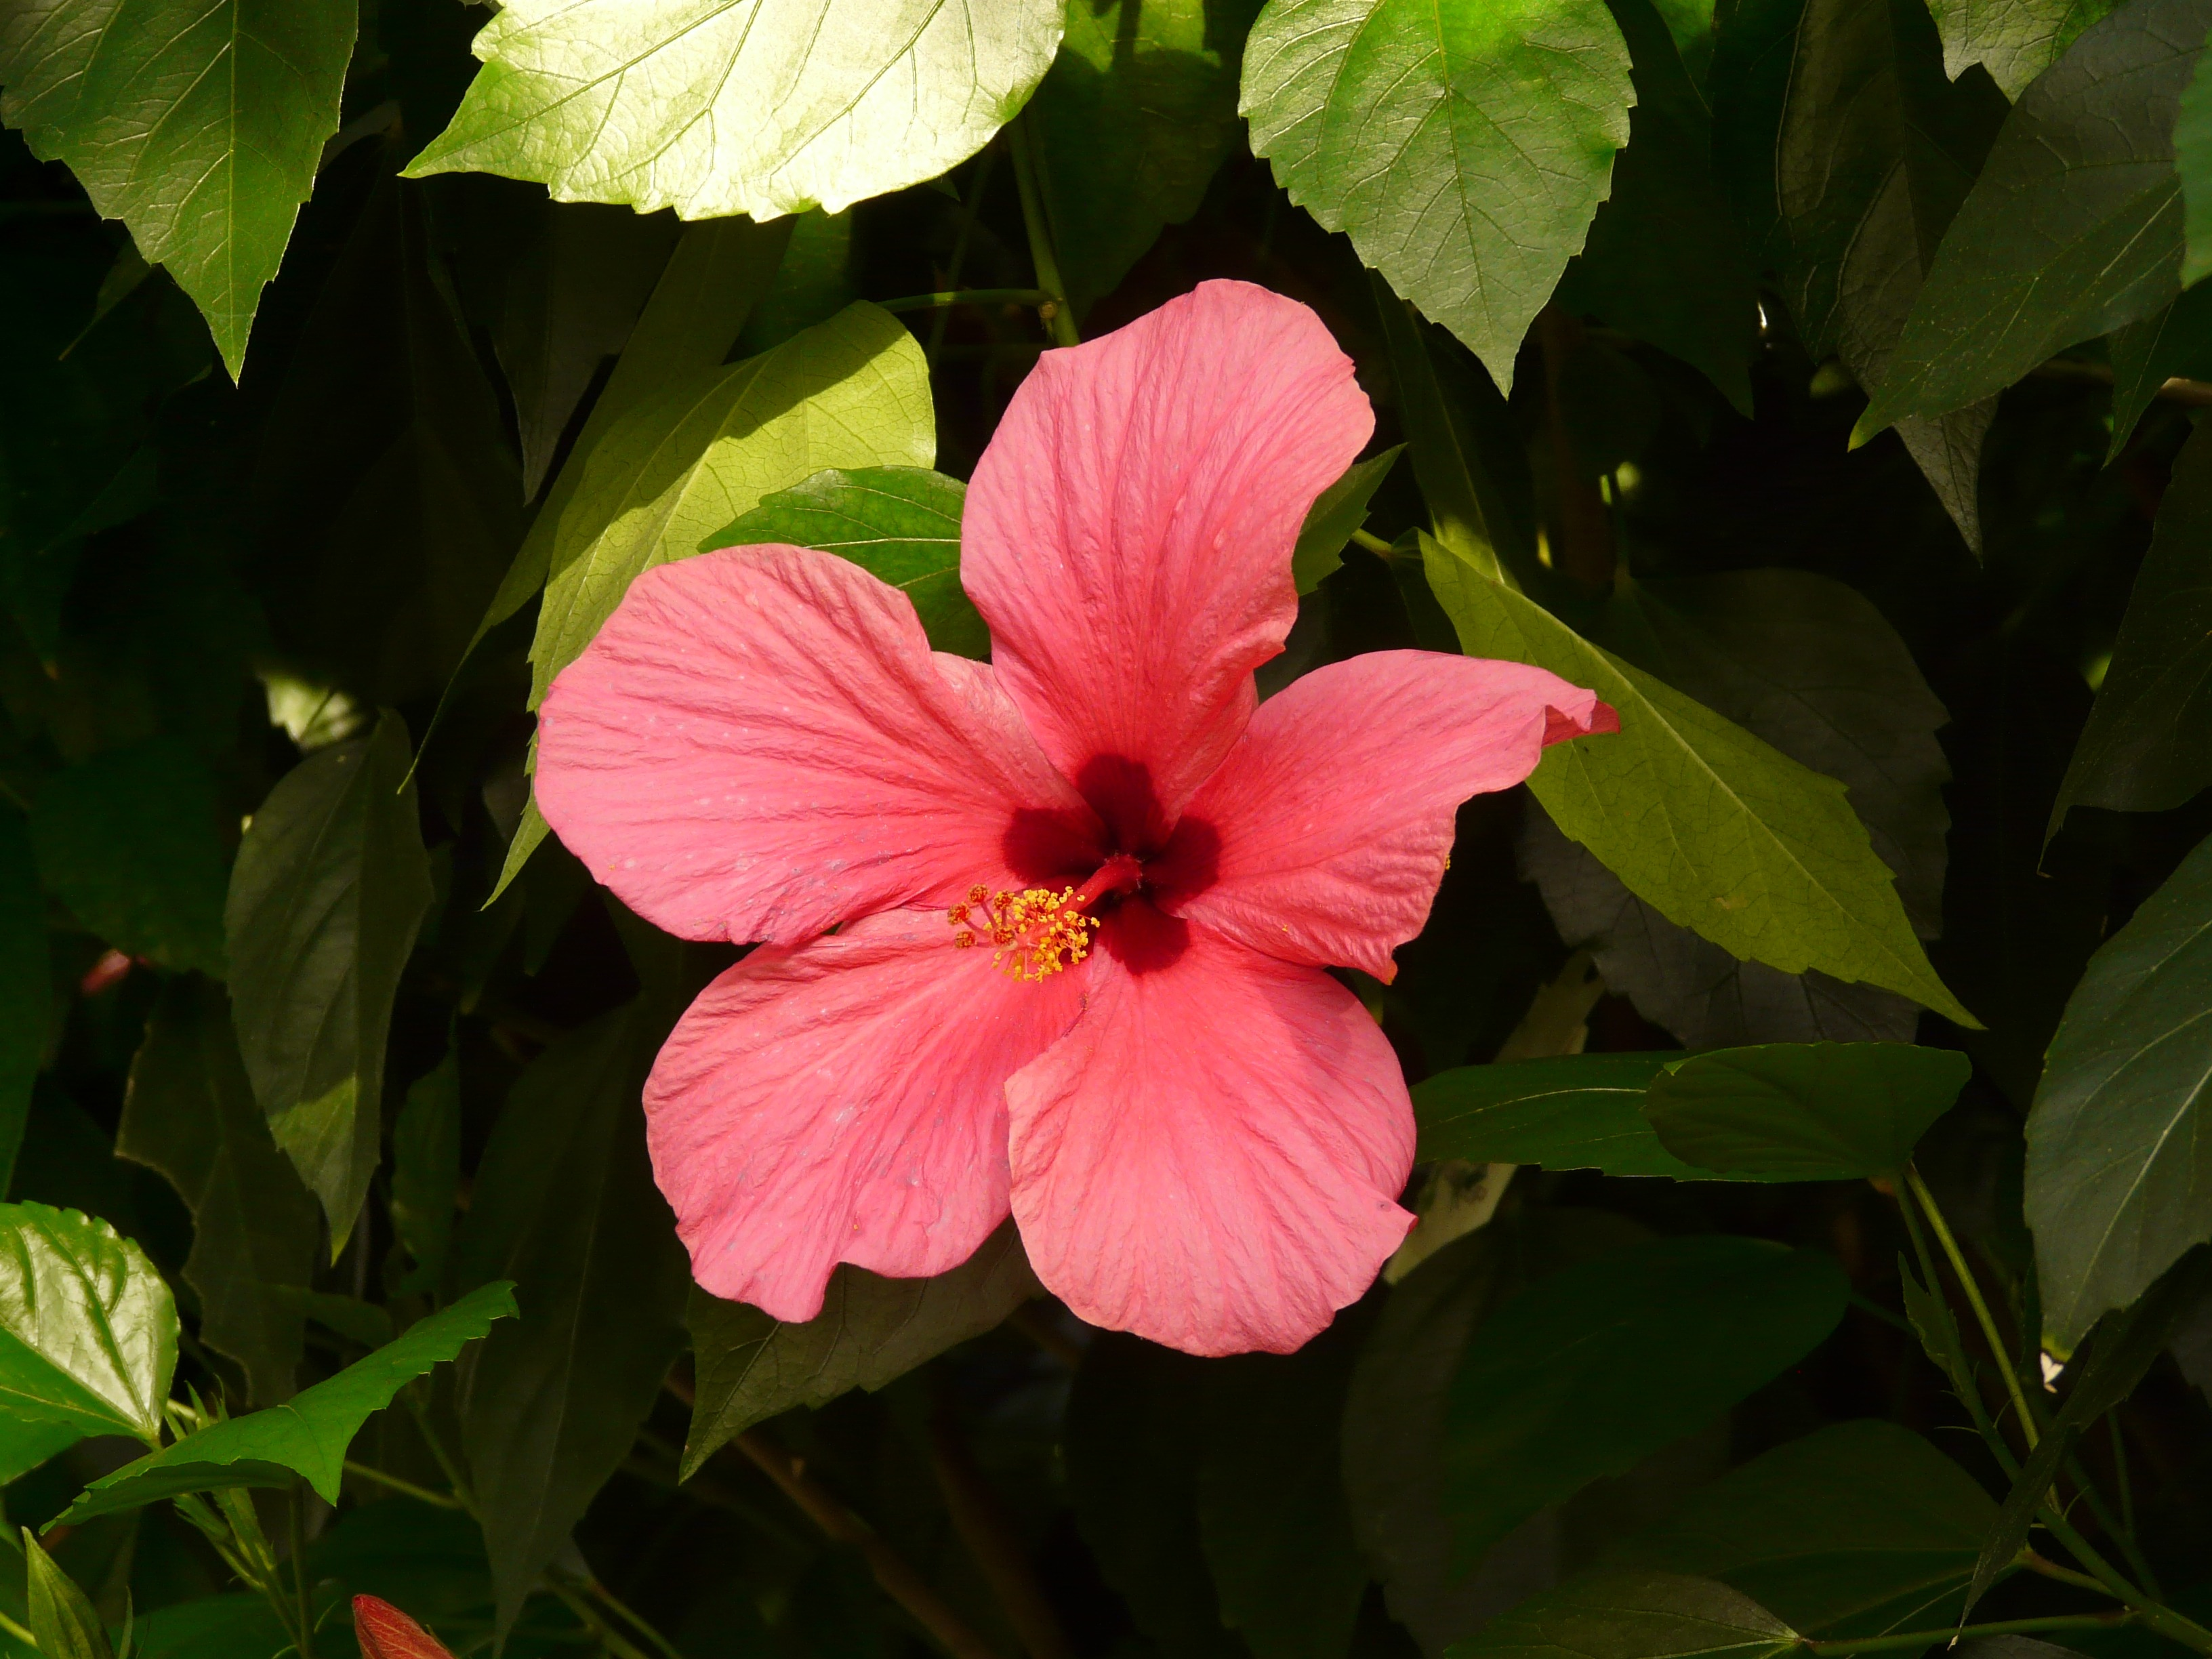 Foto di piante erbacee 18